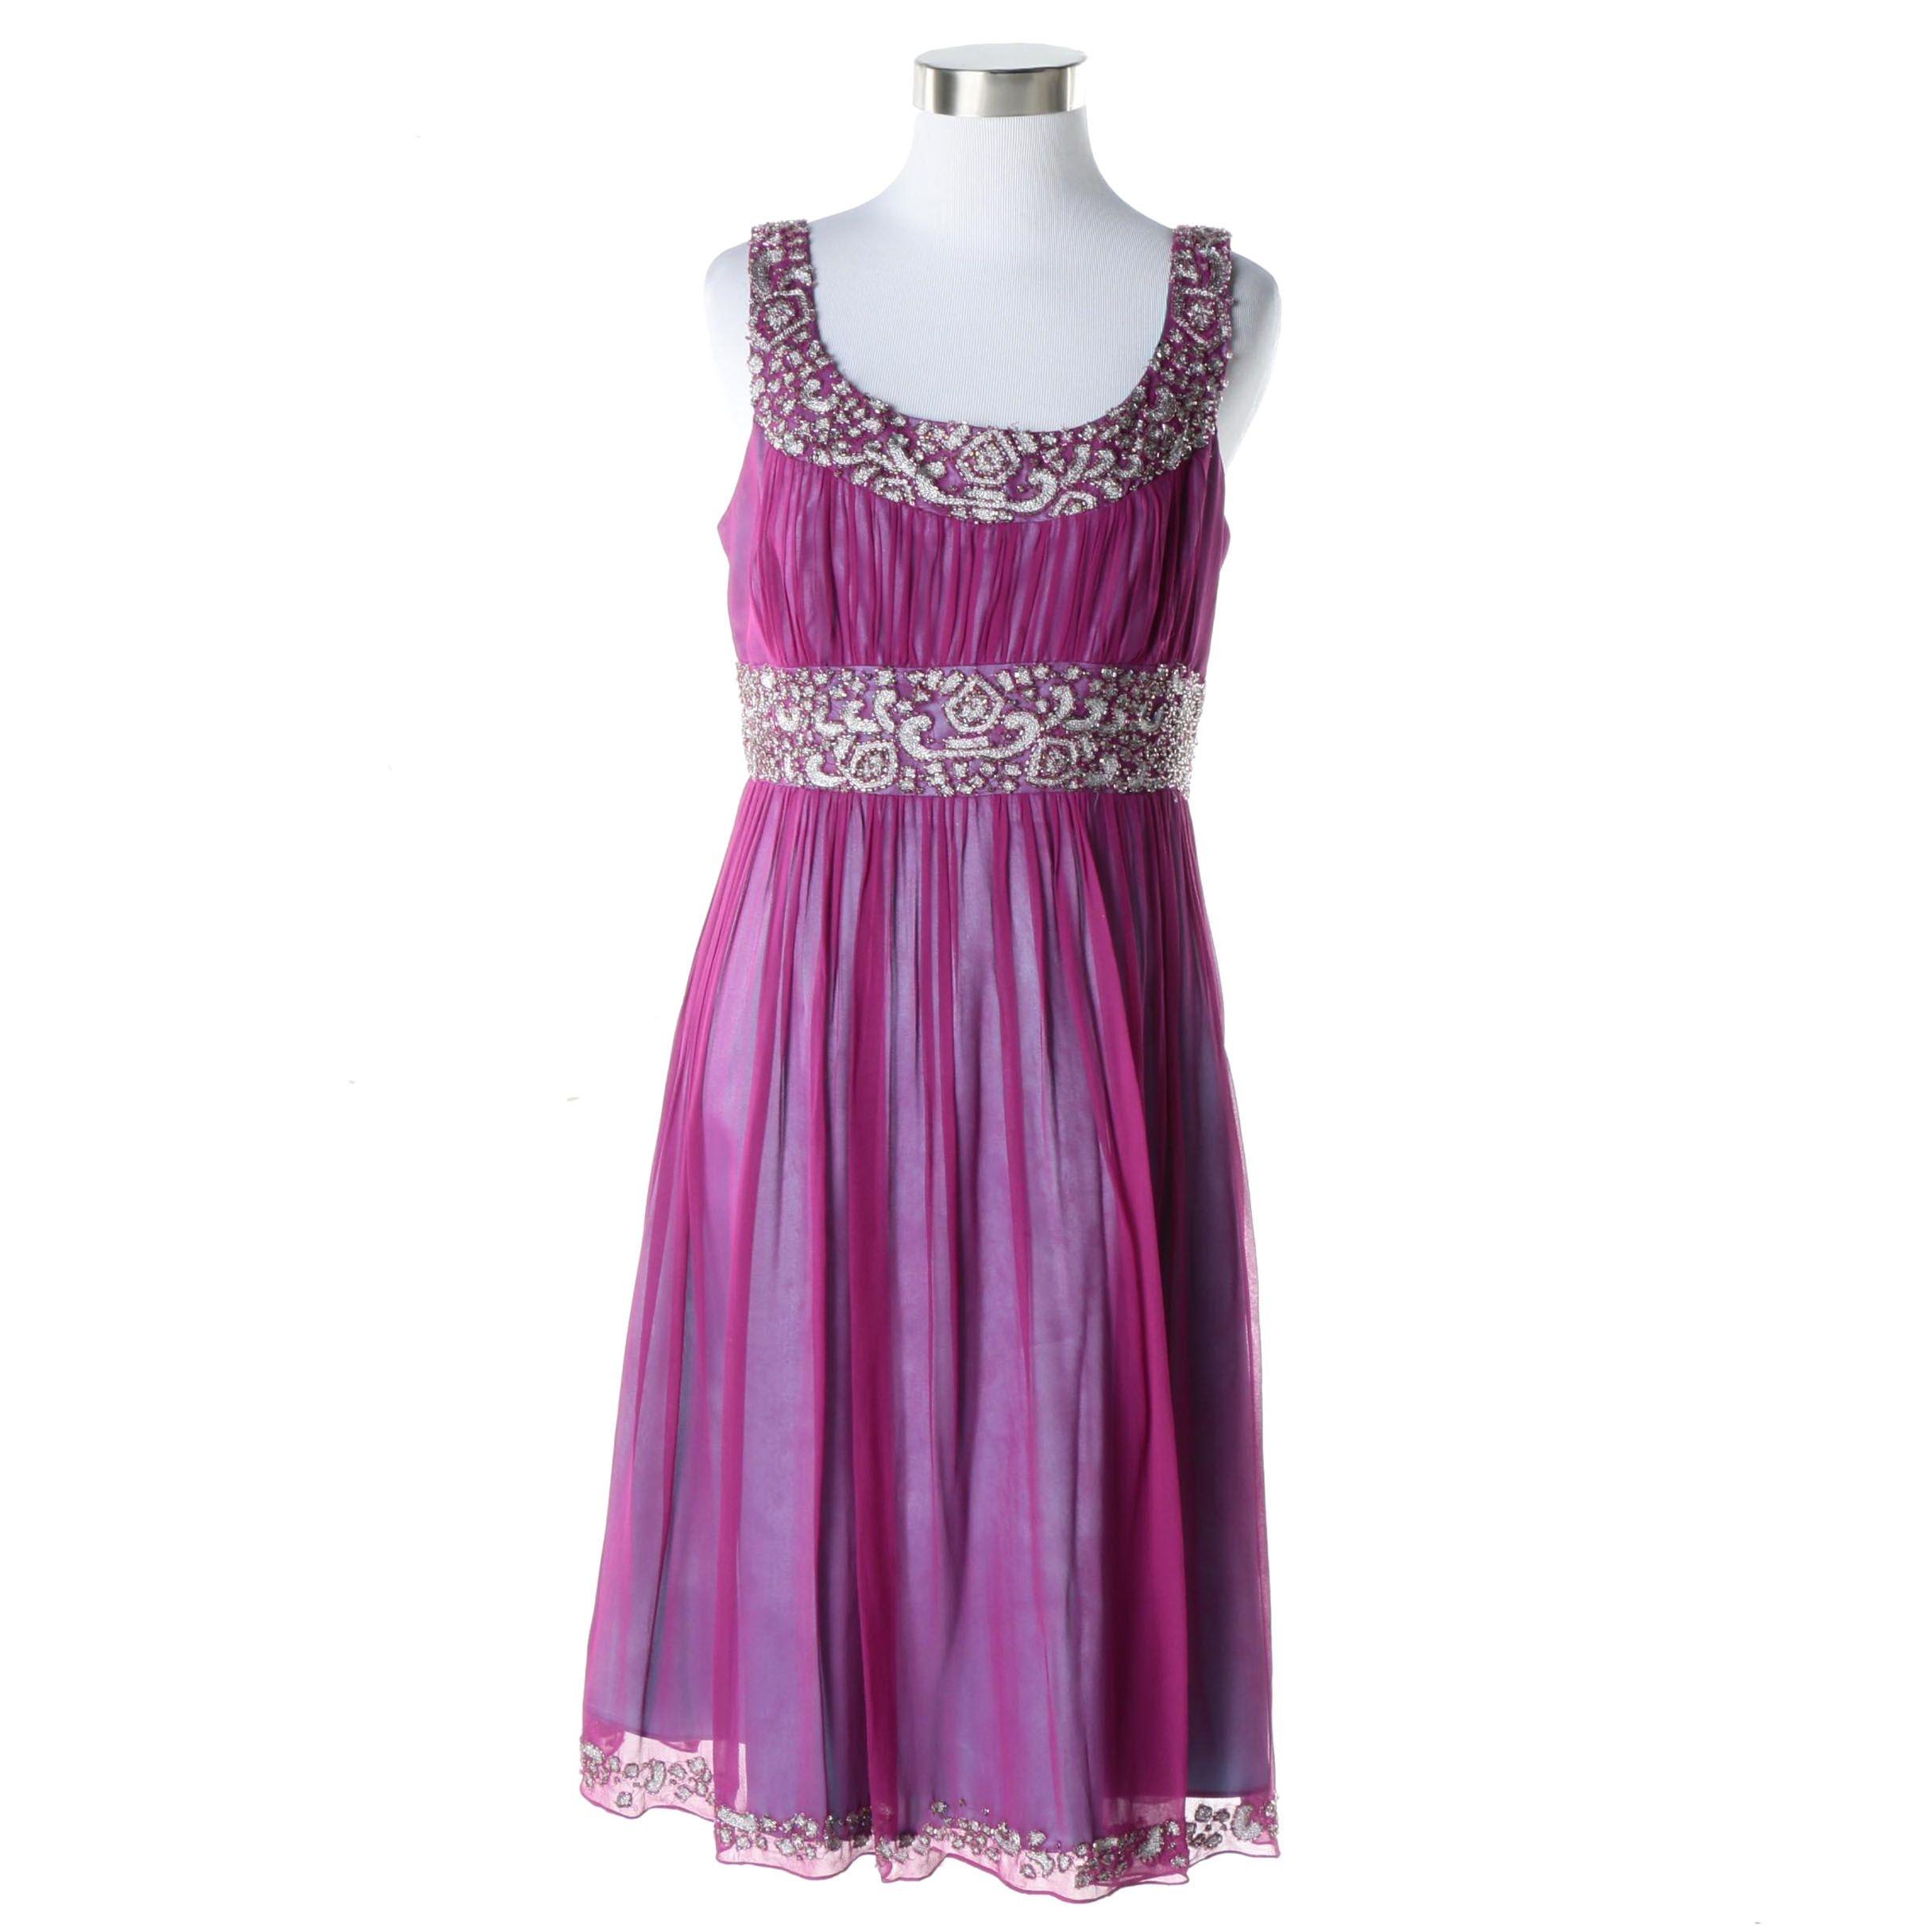 Adrianna Papell Evening Silk Cocktail Dress